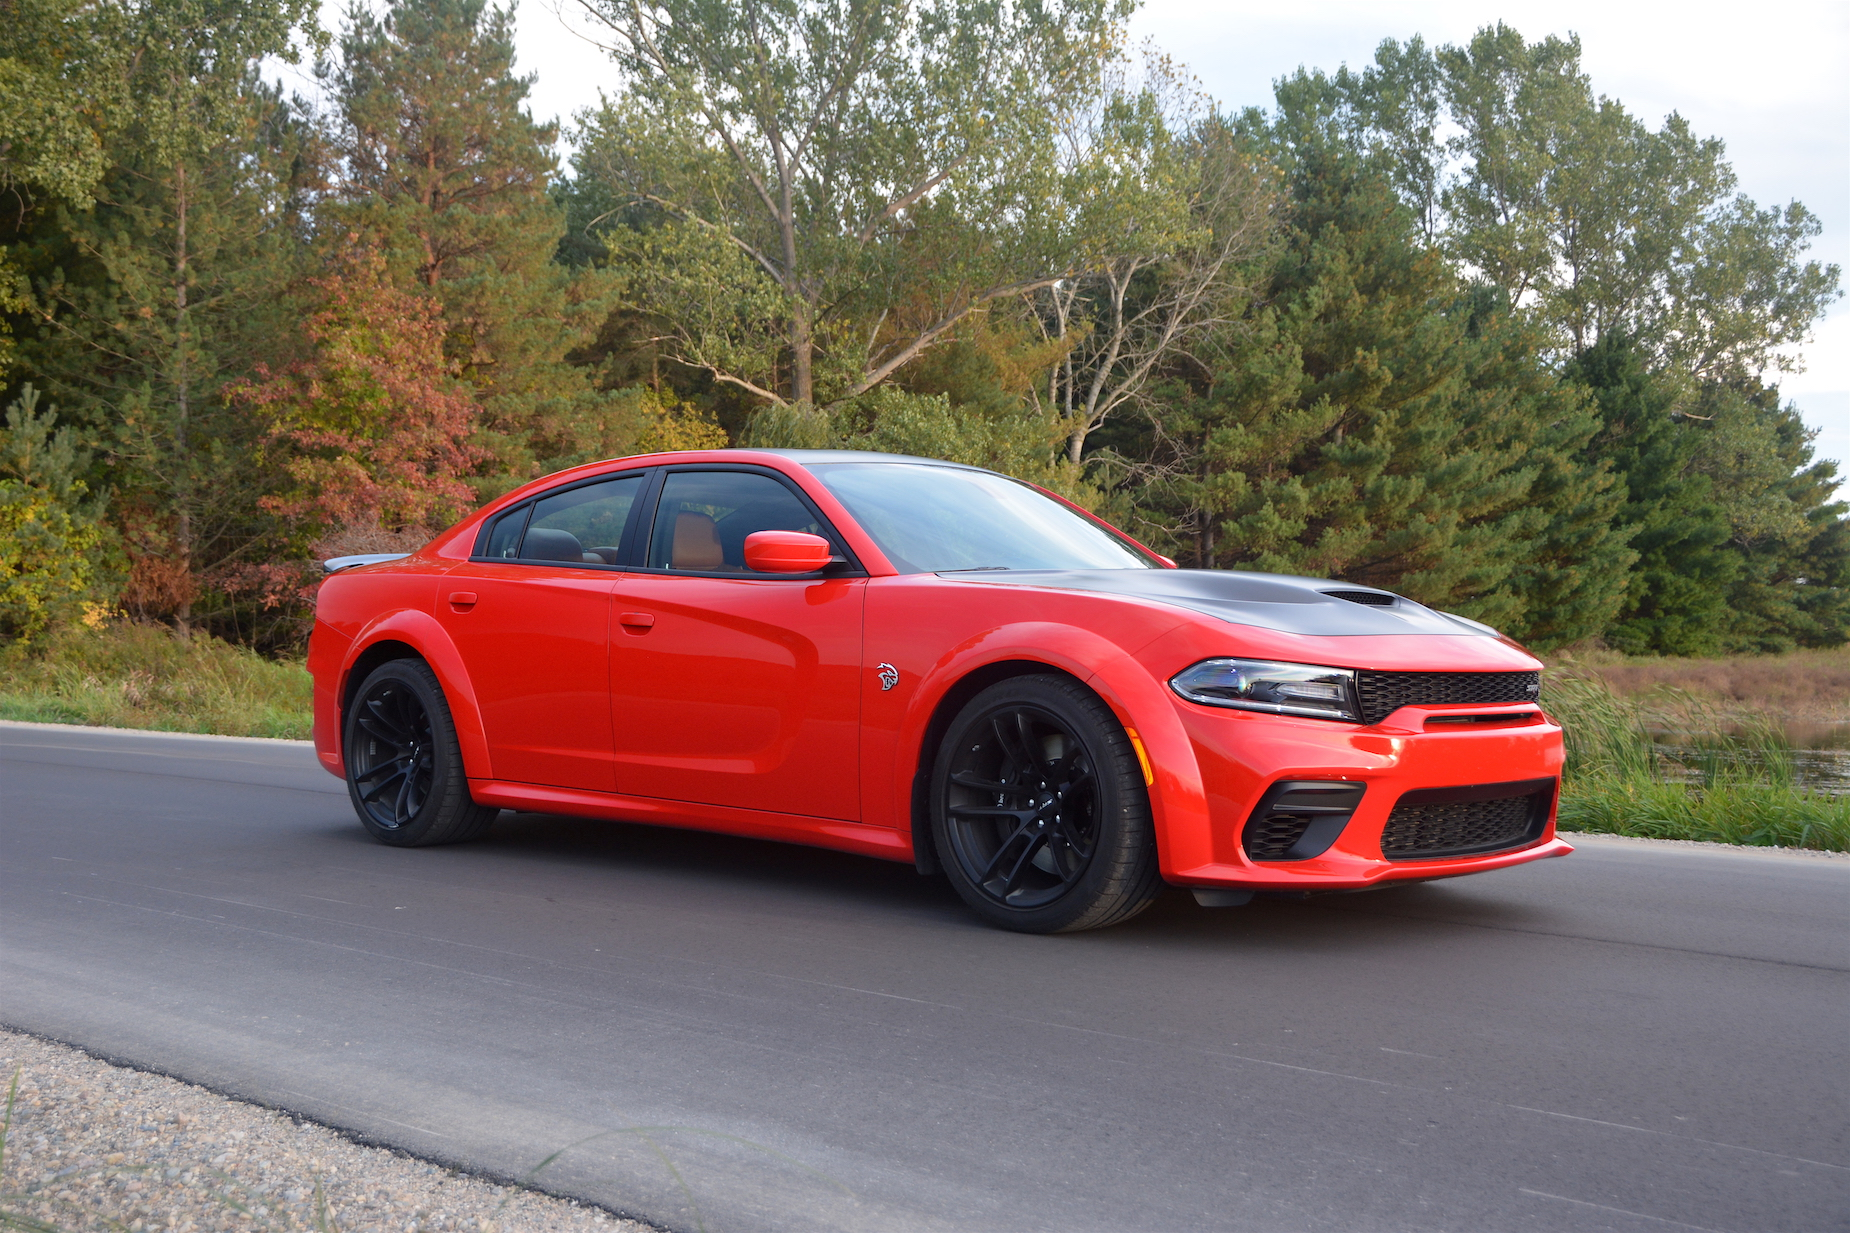 Orange Dodge Charger SRT Hellcat Widebody